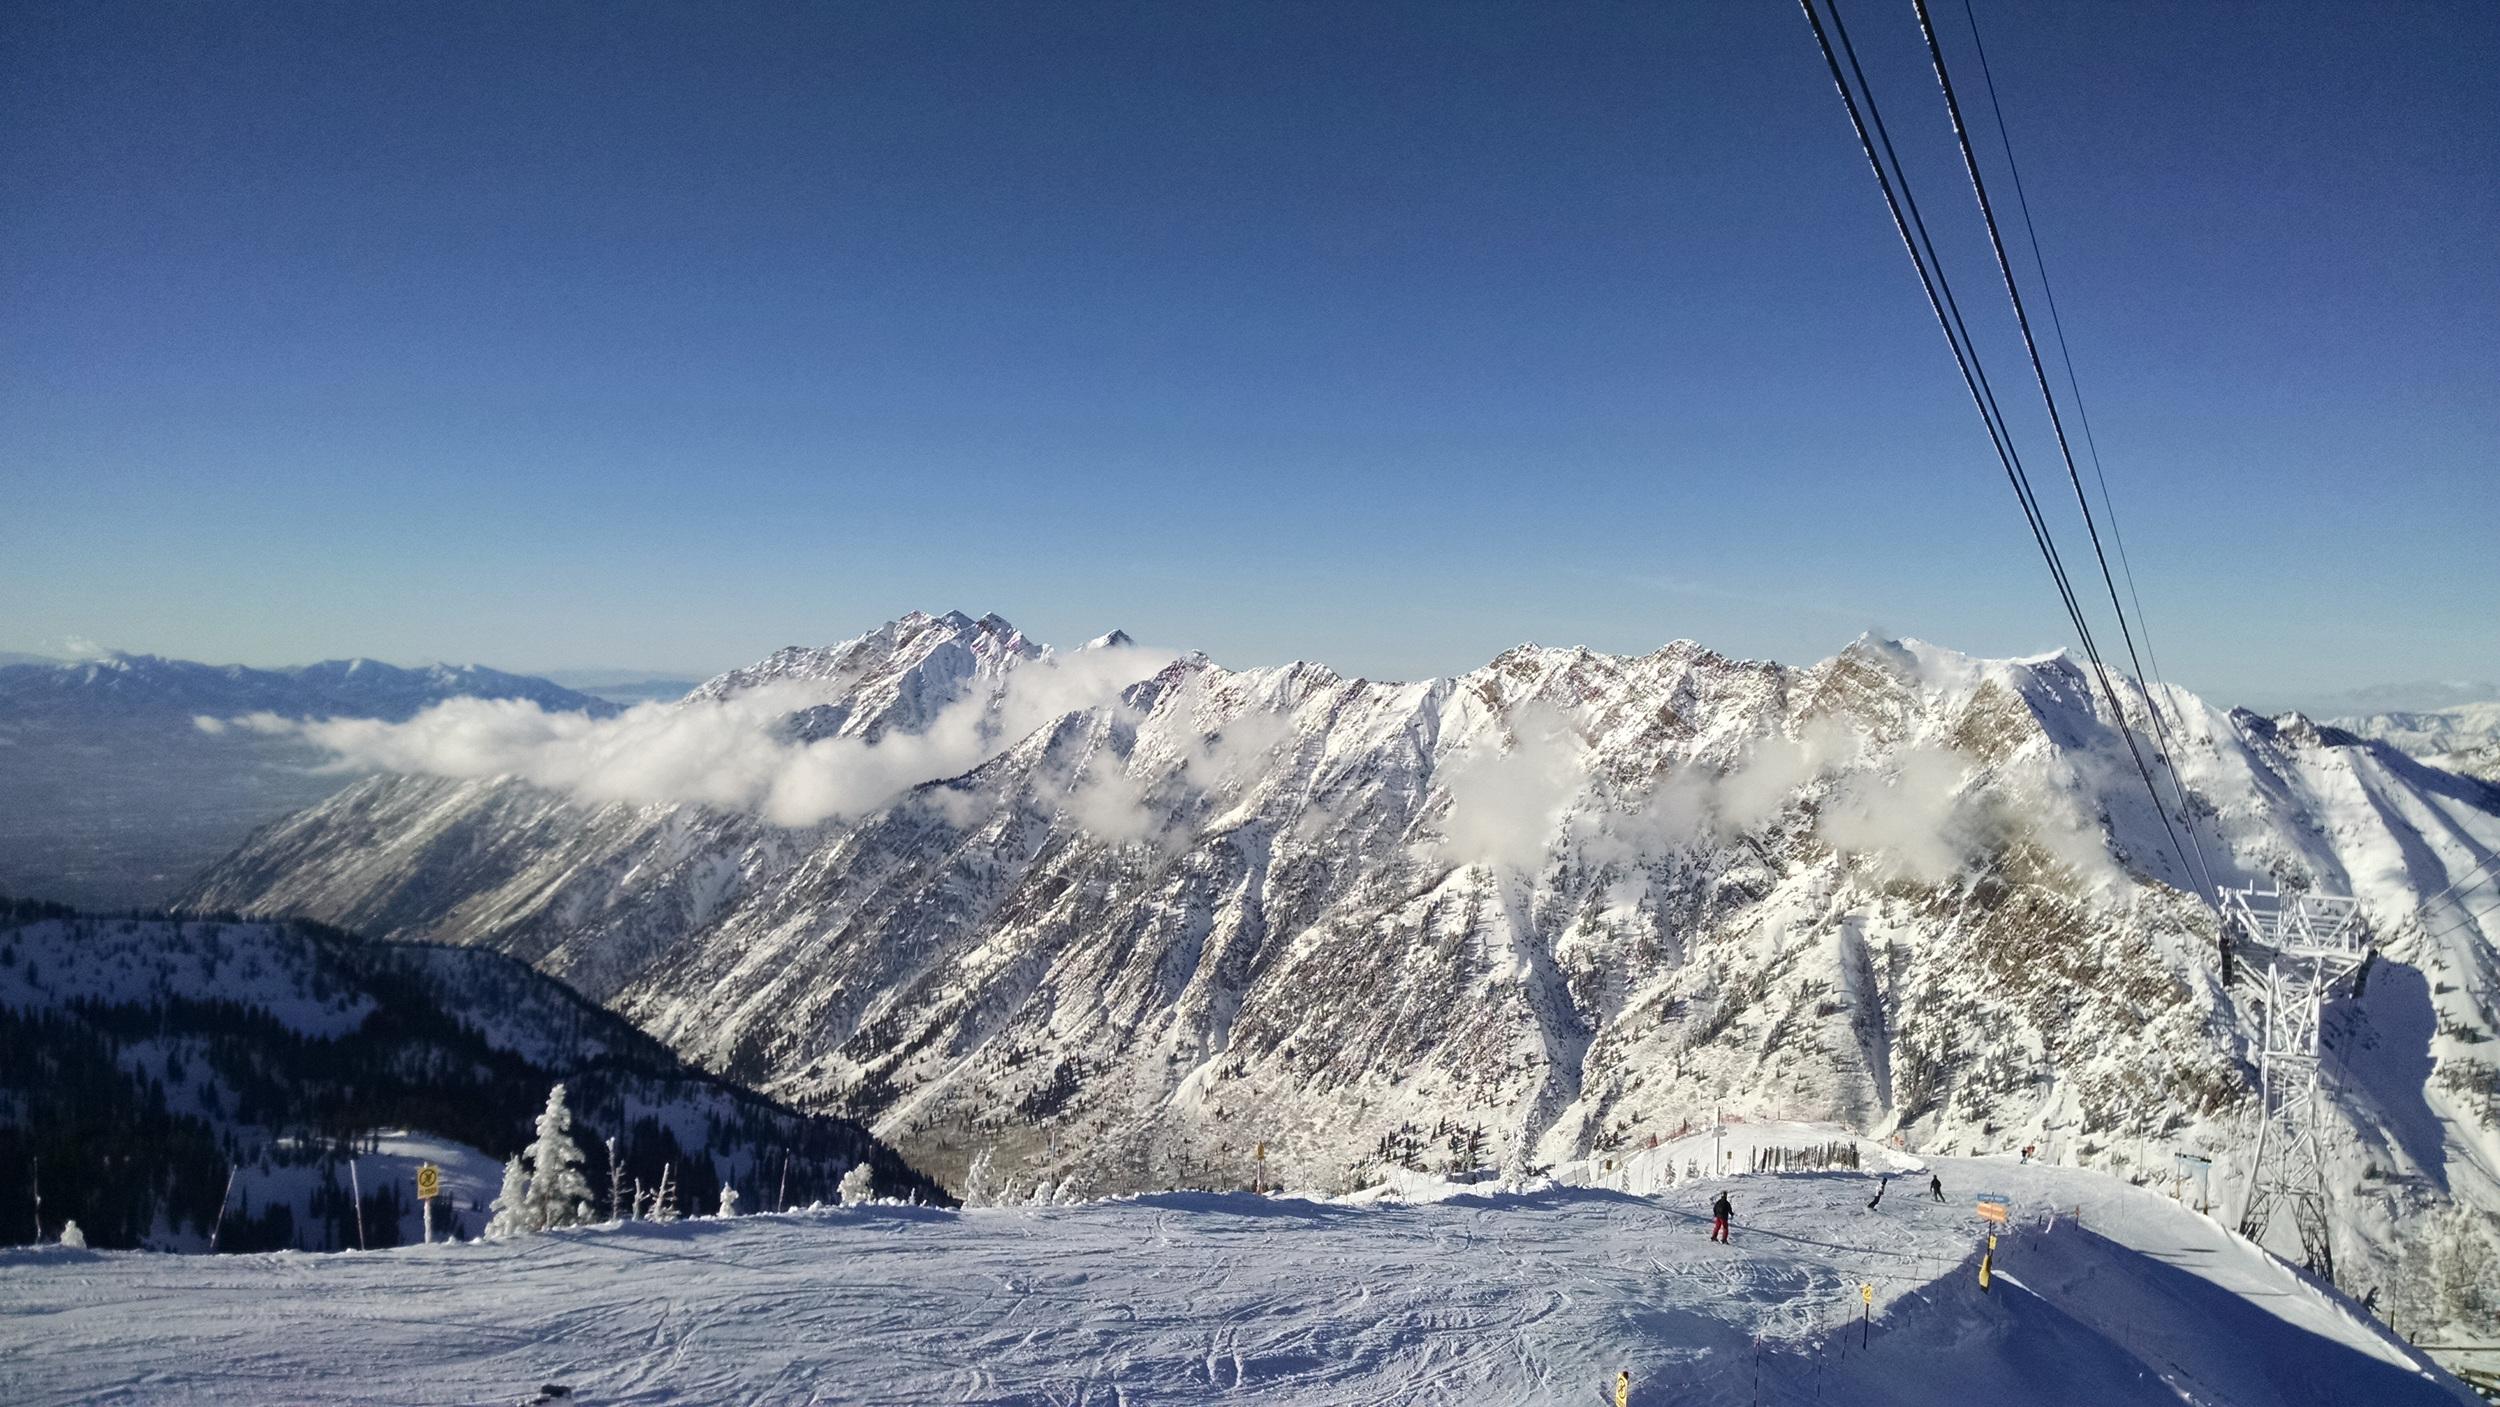 Snowbird ski resort_ Top of the tram lift, view of SLC valley.jpg